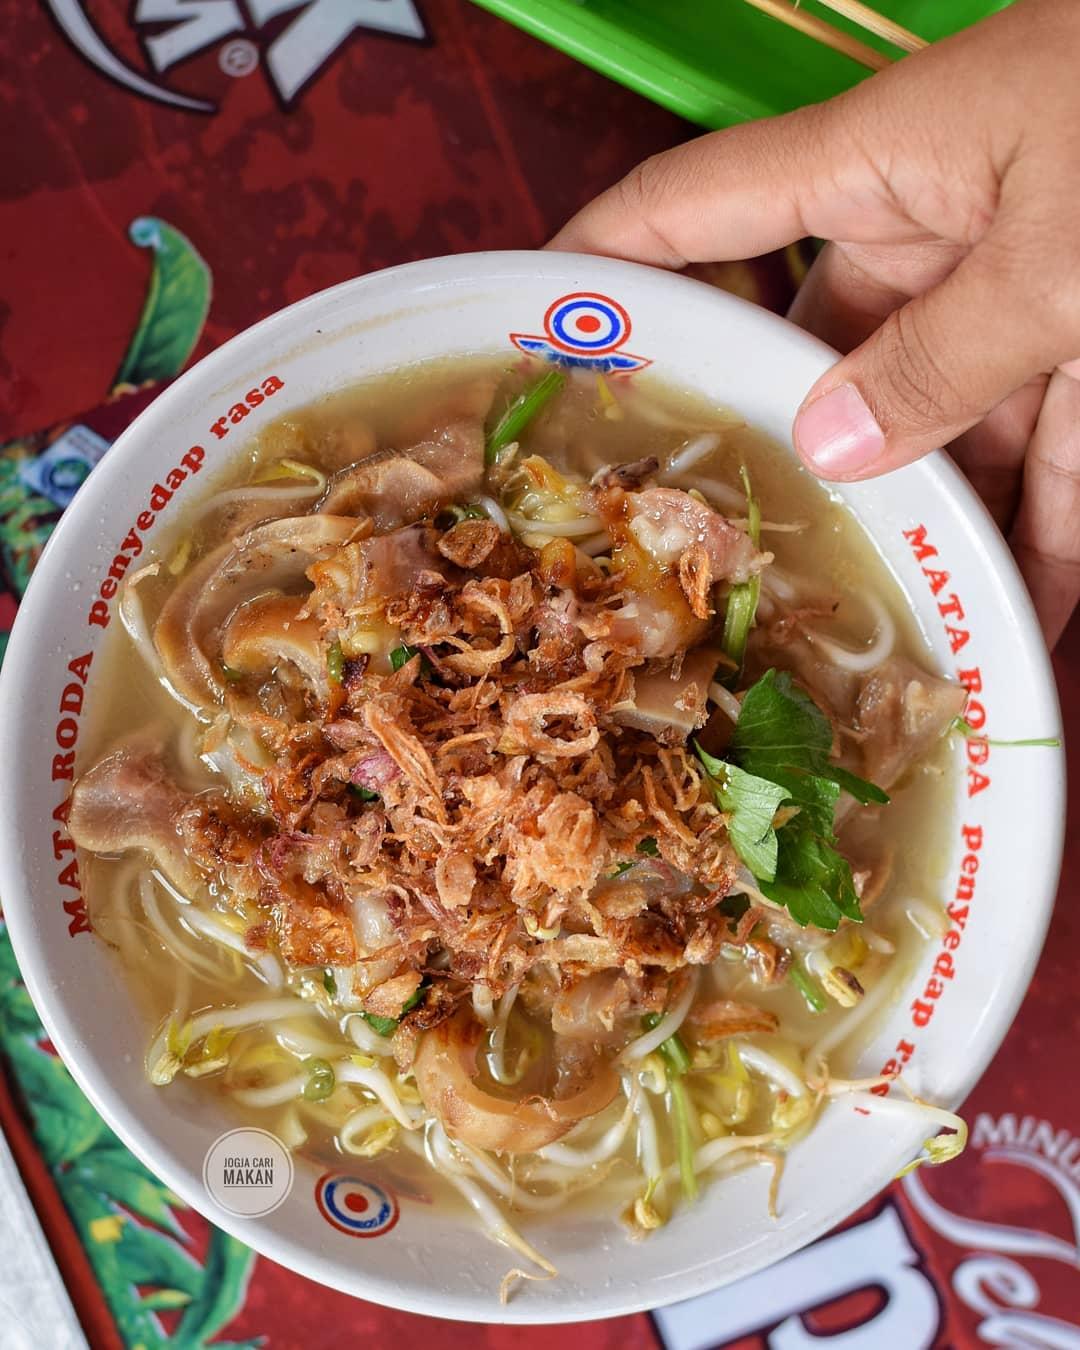 8 Mie Ayam Enak Pas Buat Jajan Kenyang Saat Hujan Di Yogyakarta